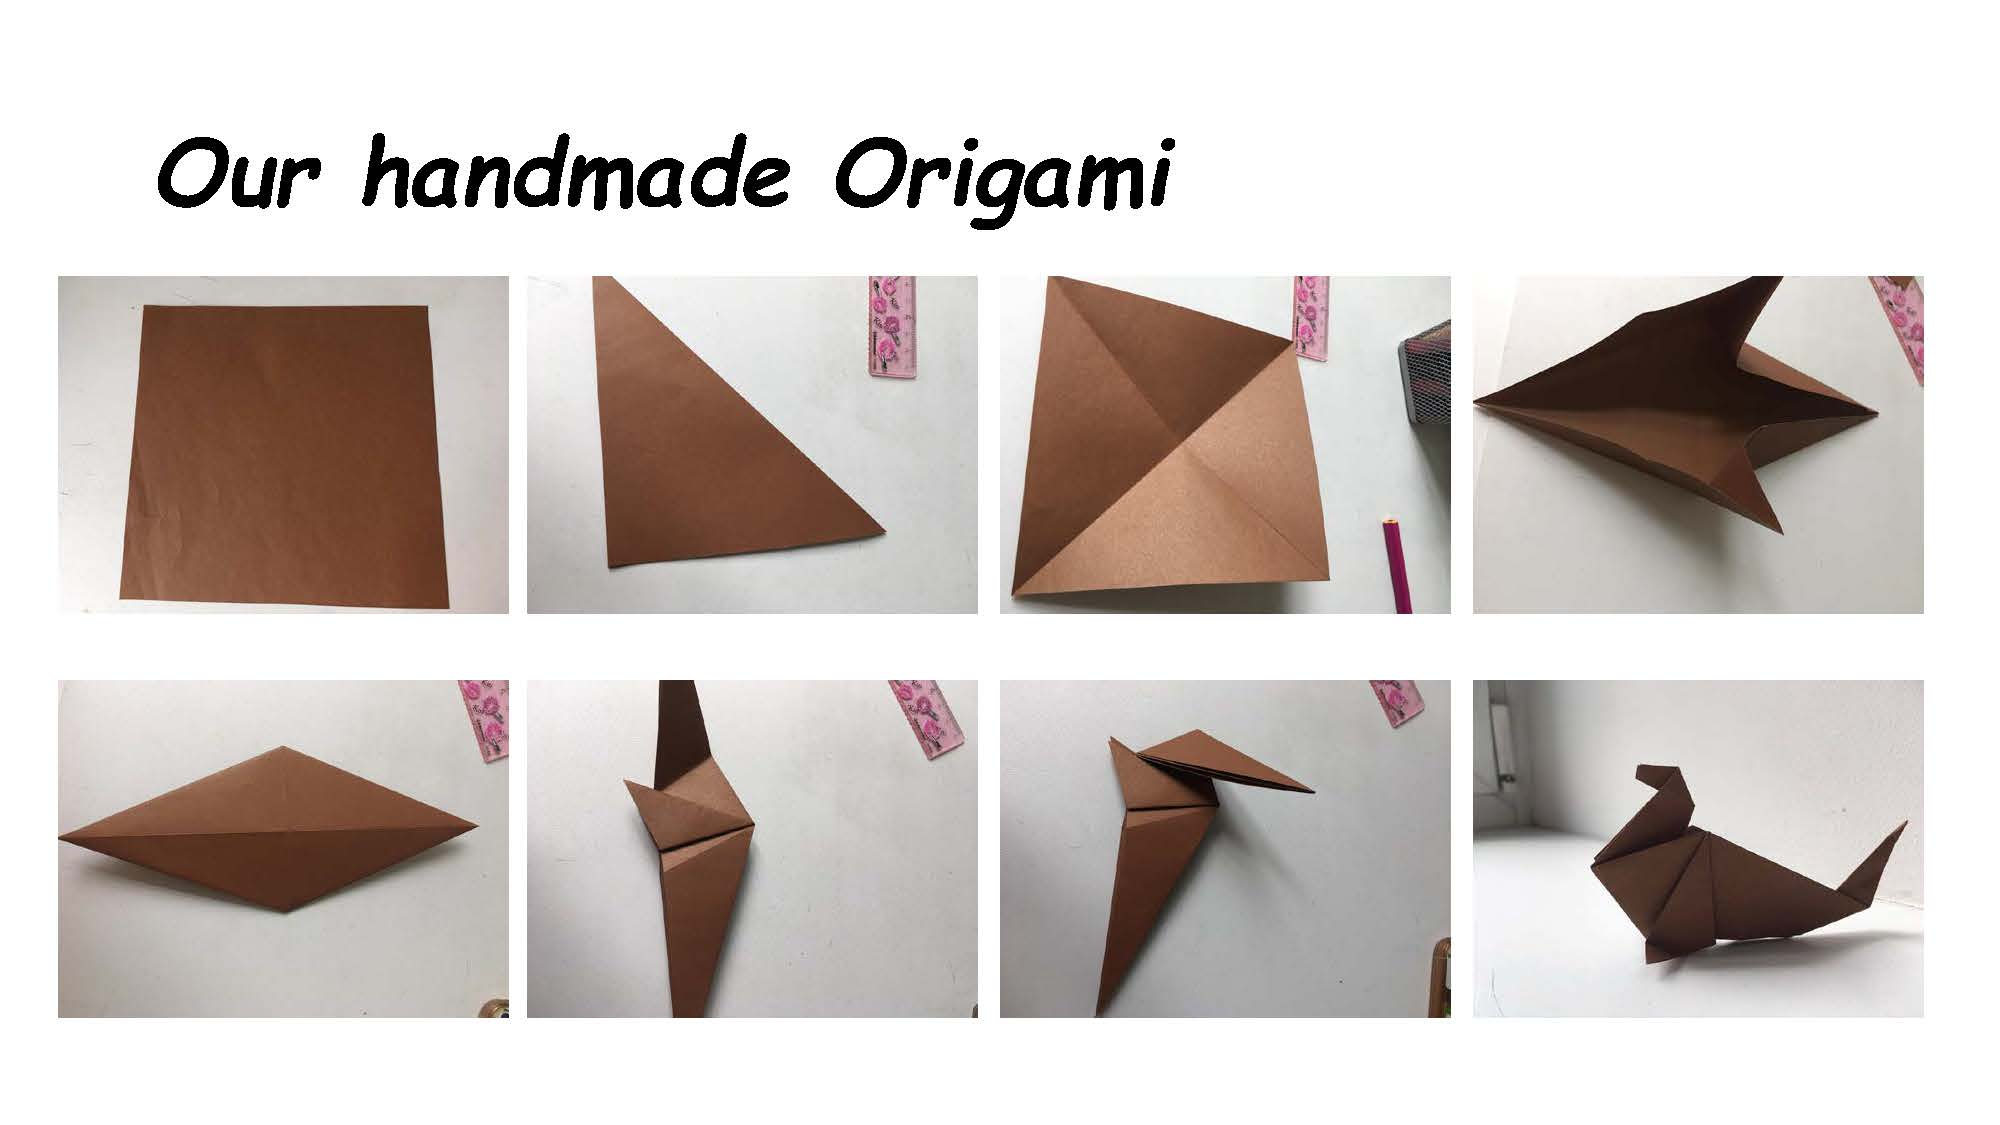 The-Art-of-Origami-–-My-Experience-karina-greta-daniela-gabriele-p_Page_15